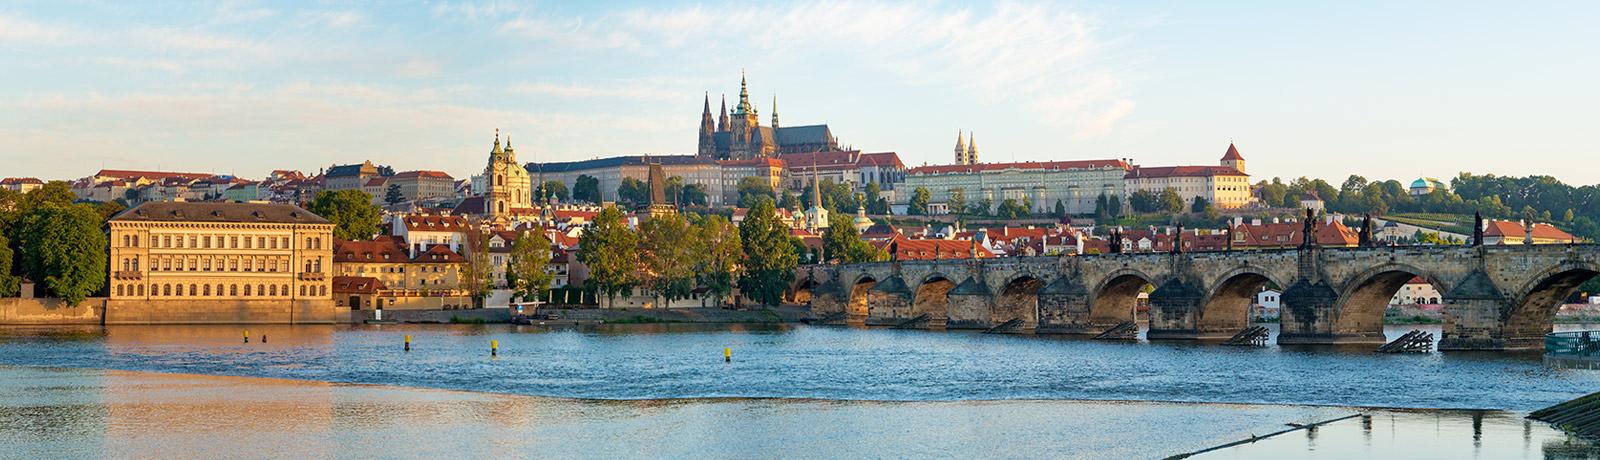 Hotele i motele w Pradze